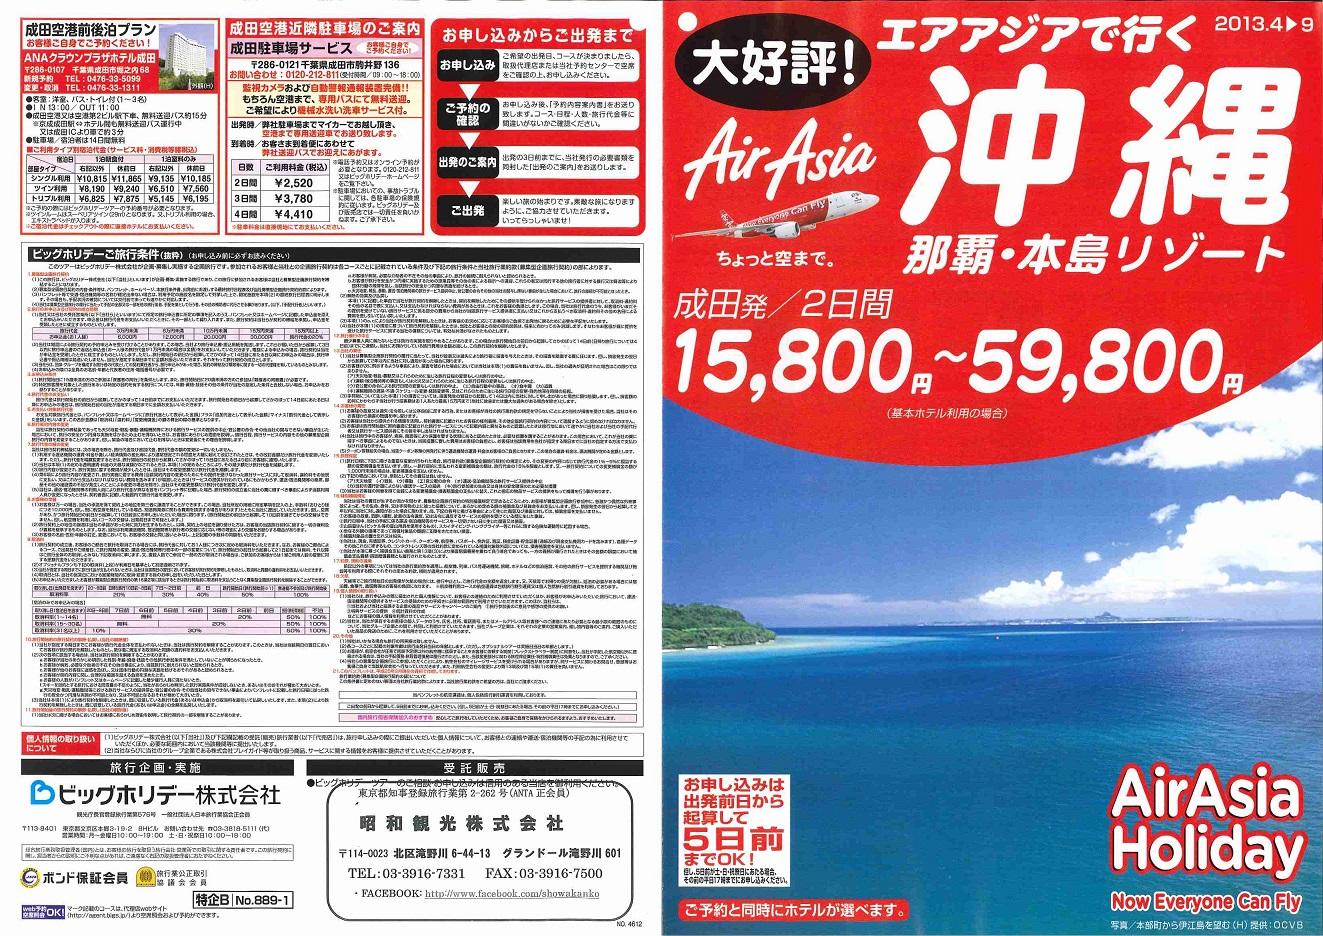 http://www.ianryoko.jp/%E6%B2%96%E7%B8%84%E8%A1%A8%E8%A3%8F.jpg